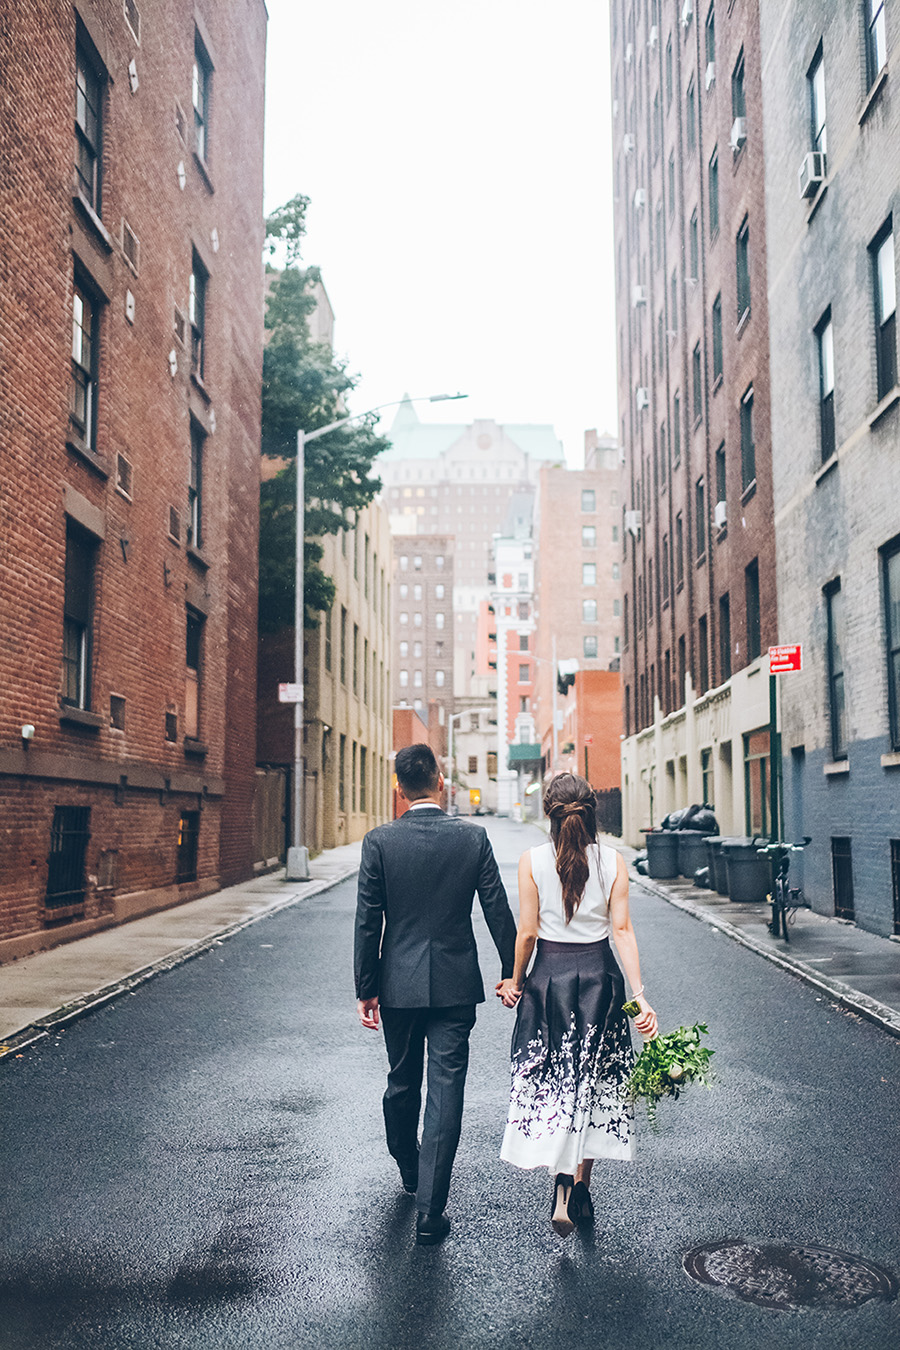 NEW-YORK-CITY-WEDDING-PHOTOGRAPHER-INTIMATE-WEDDING-ELOPEMENT-BROOKLYN-PROMENADE-CITYHALL-MANHATTAN-BROOKLYN-WEDDING-PHOTOGRAPHY-JackieAaron-0050.jpg